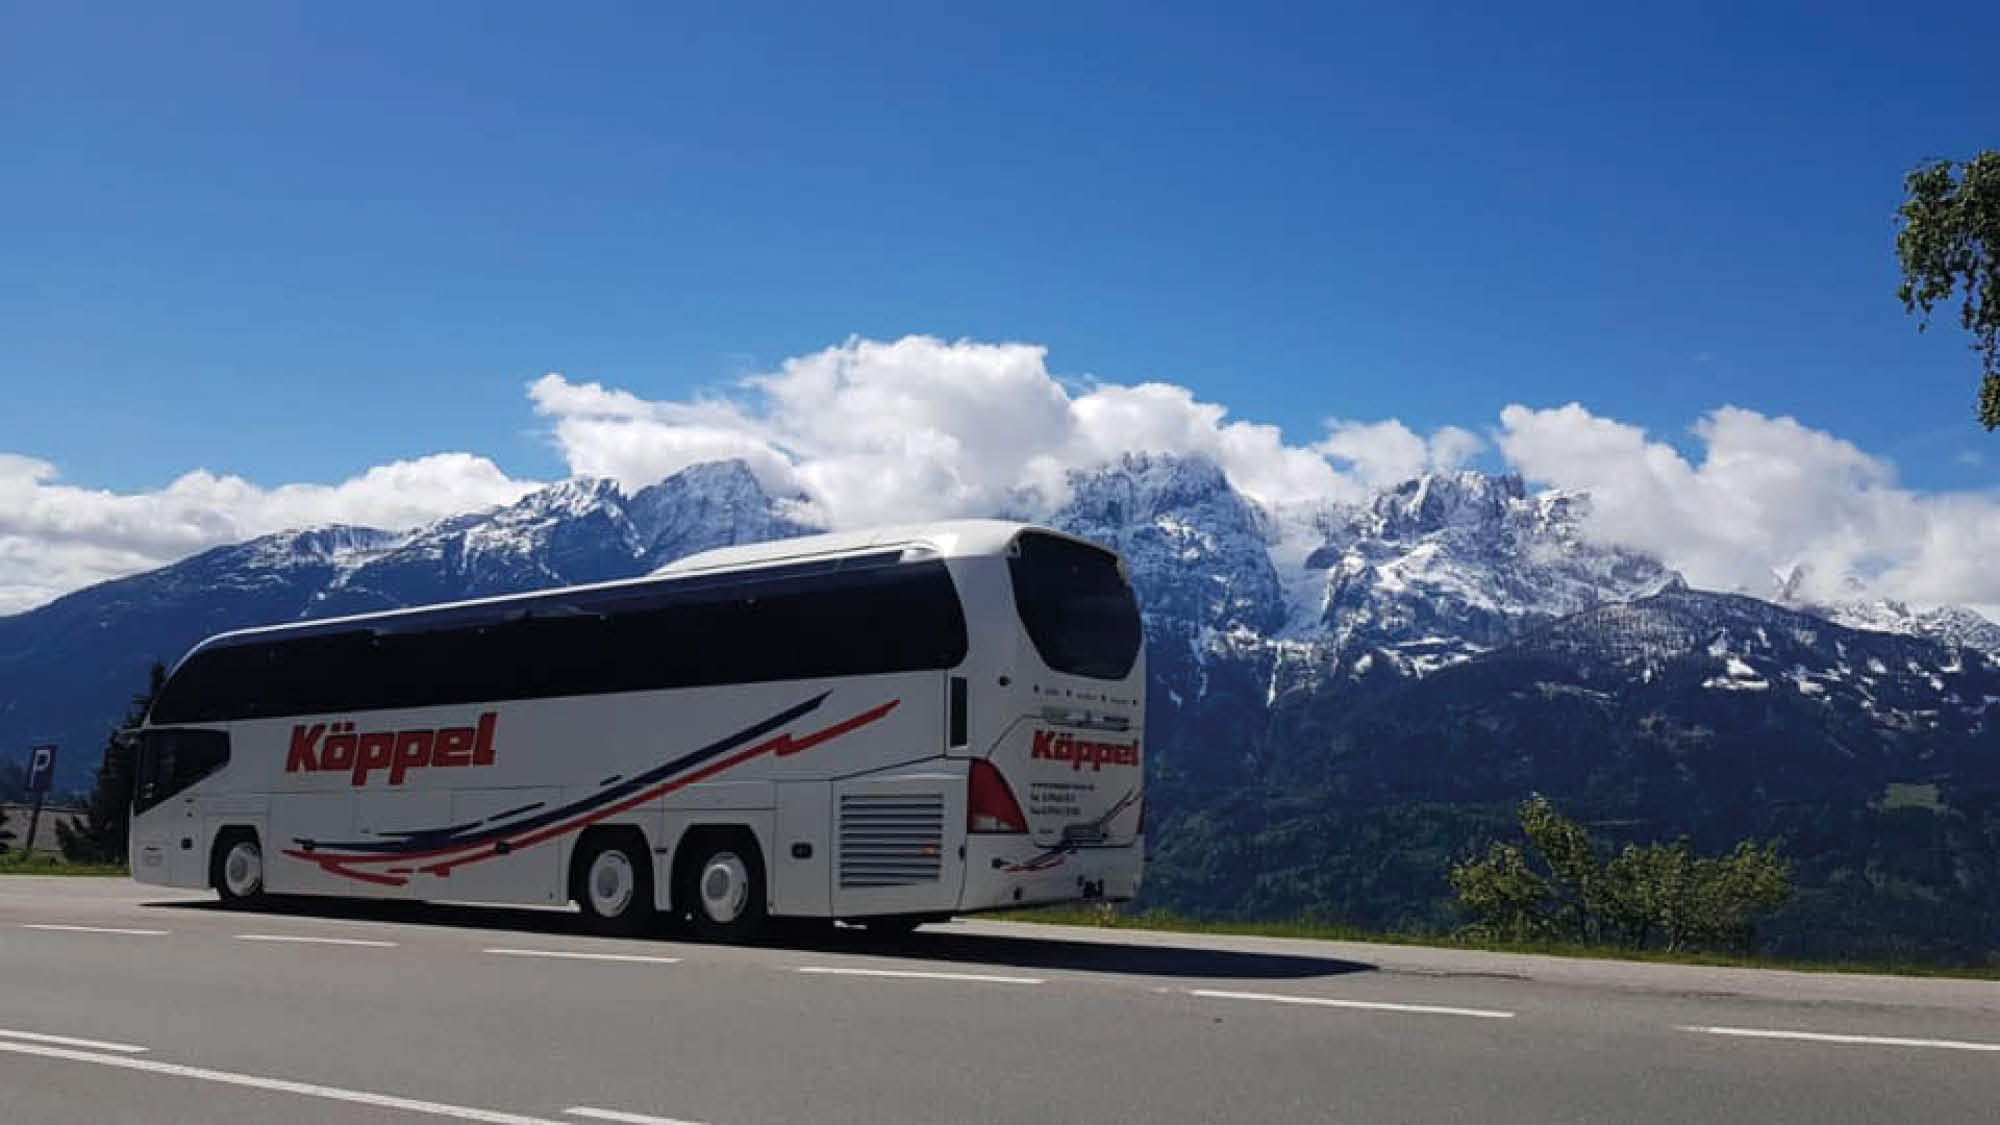 Köppel - Ellwangen - Website - Bus - 2019-12 - 02